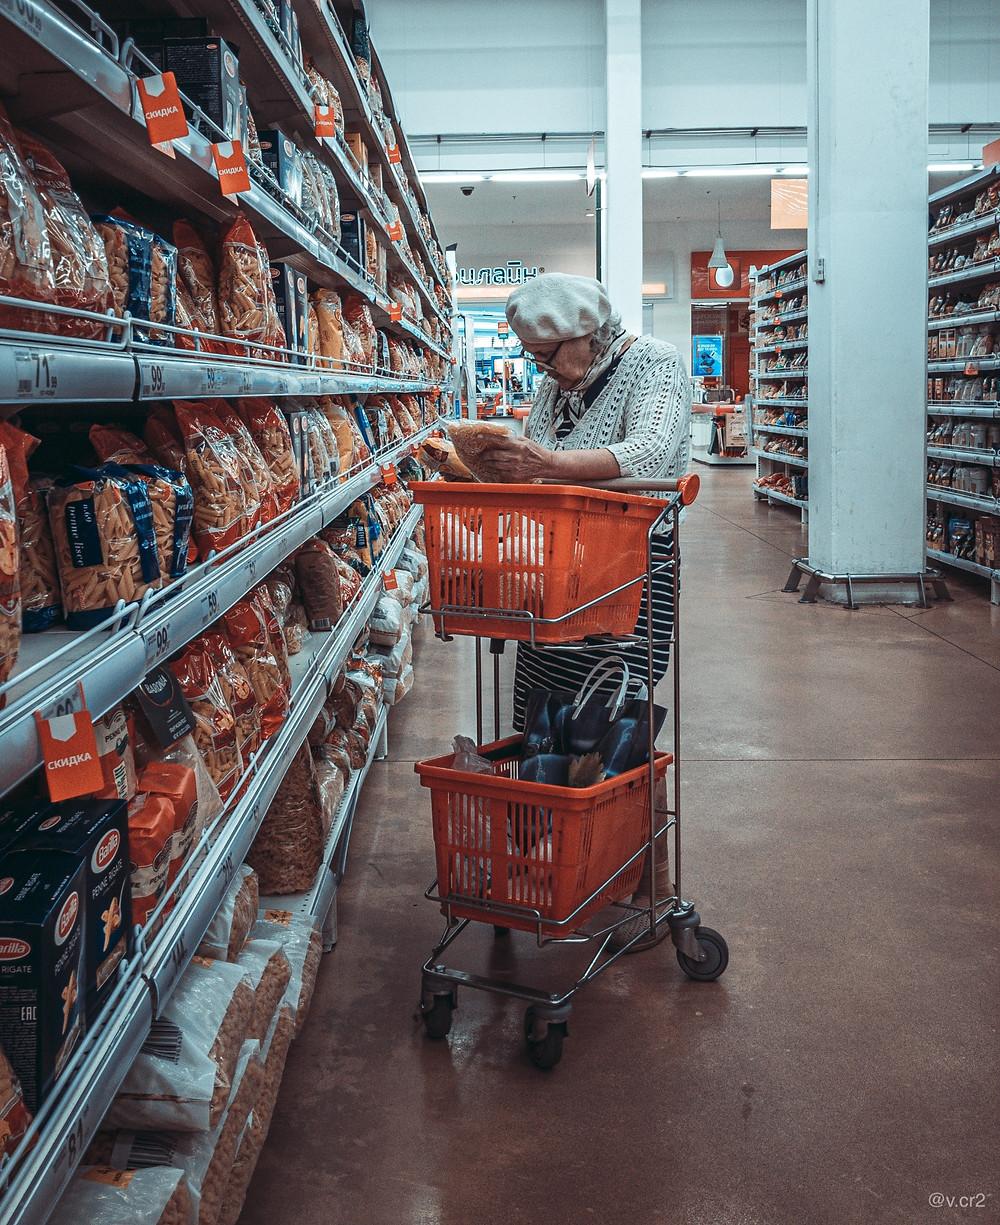 Supermarket, Old Lady